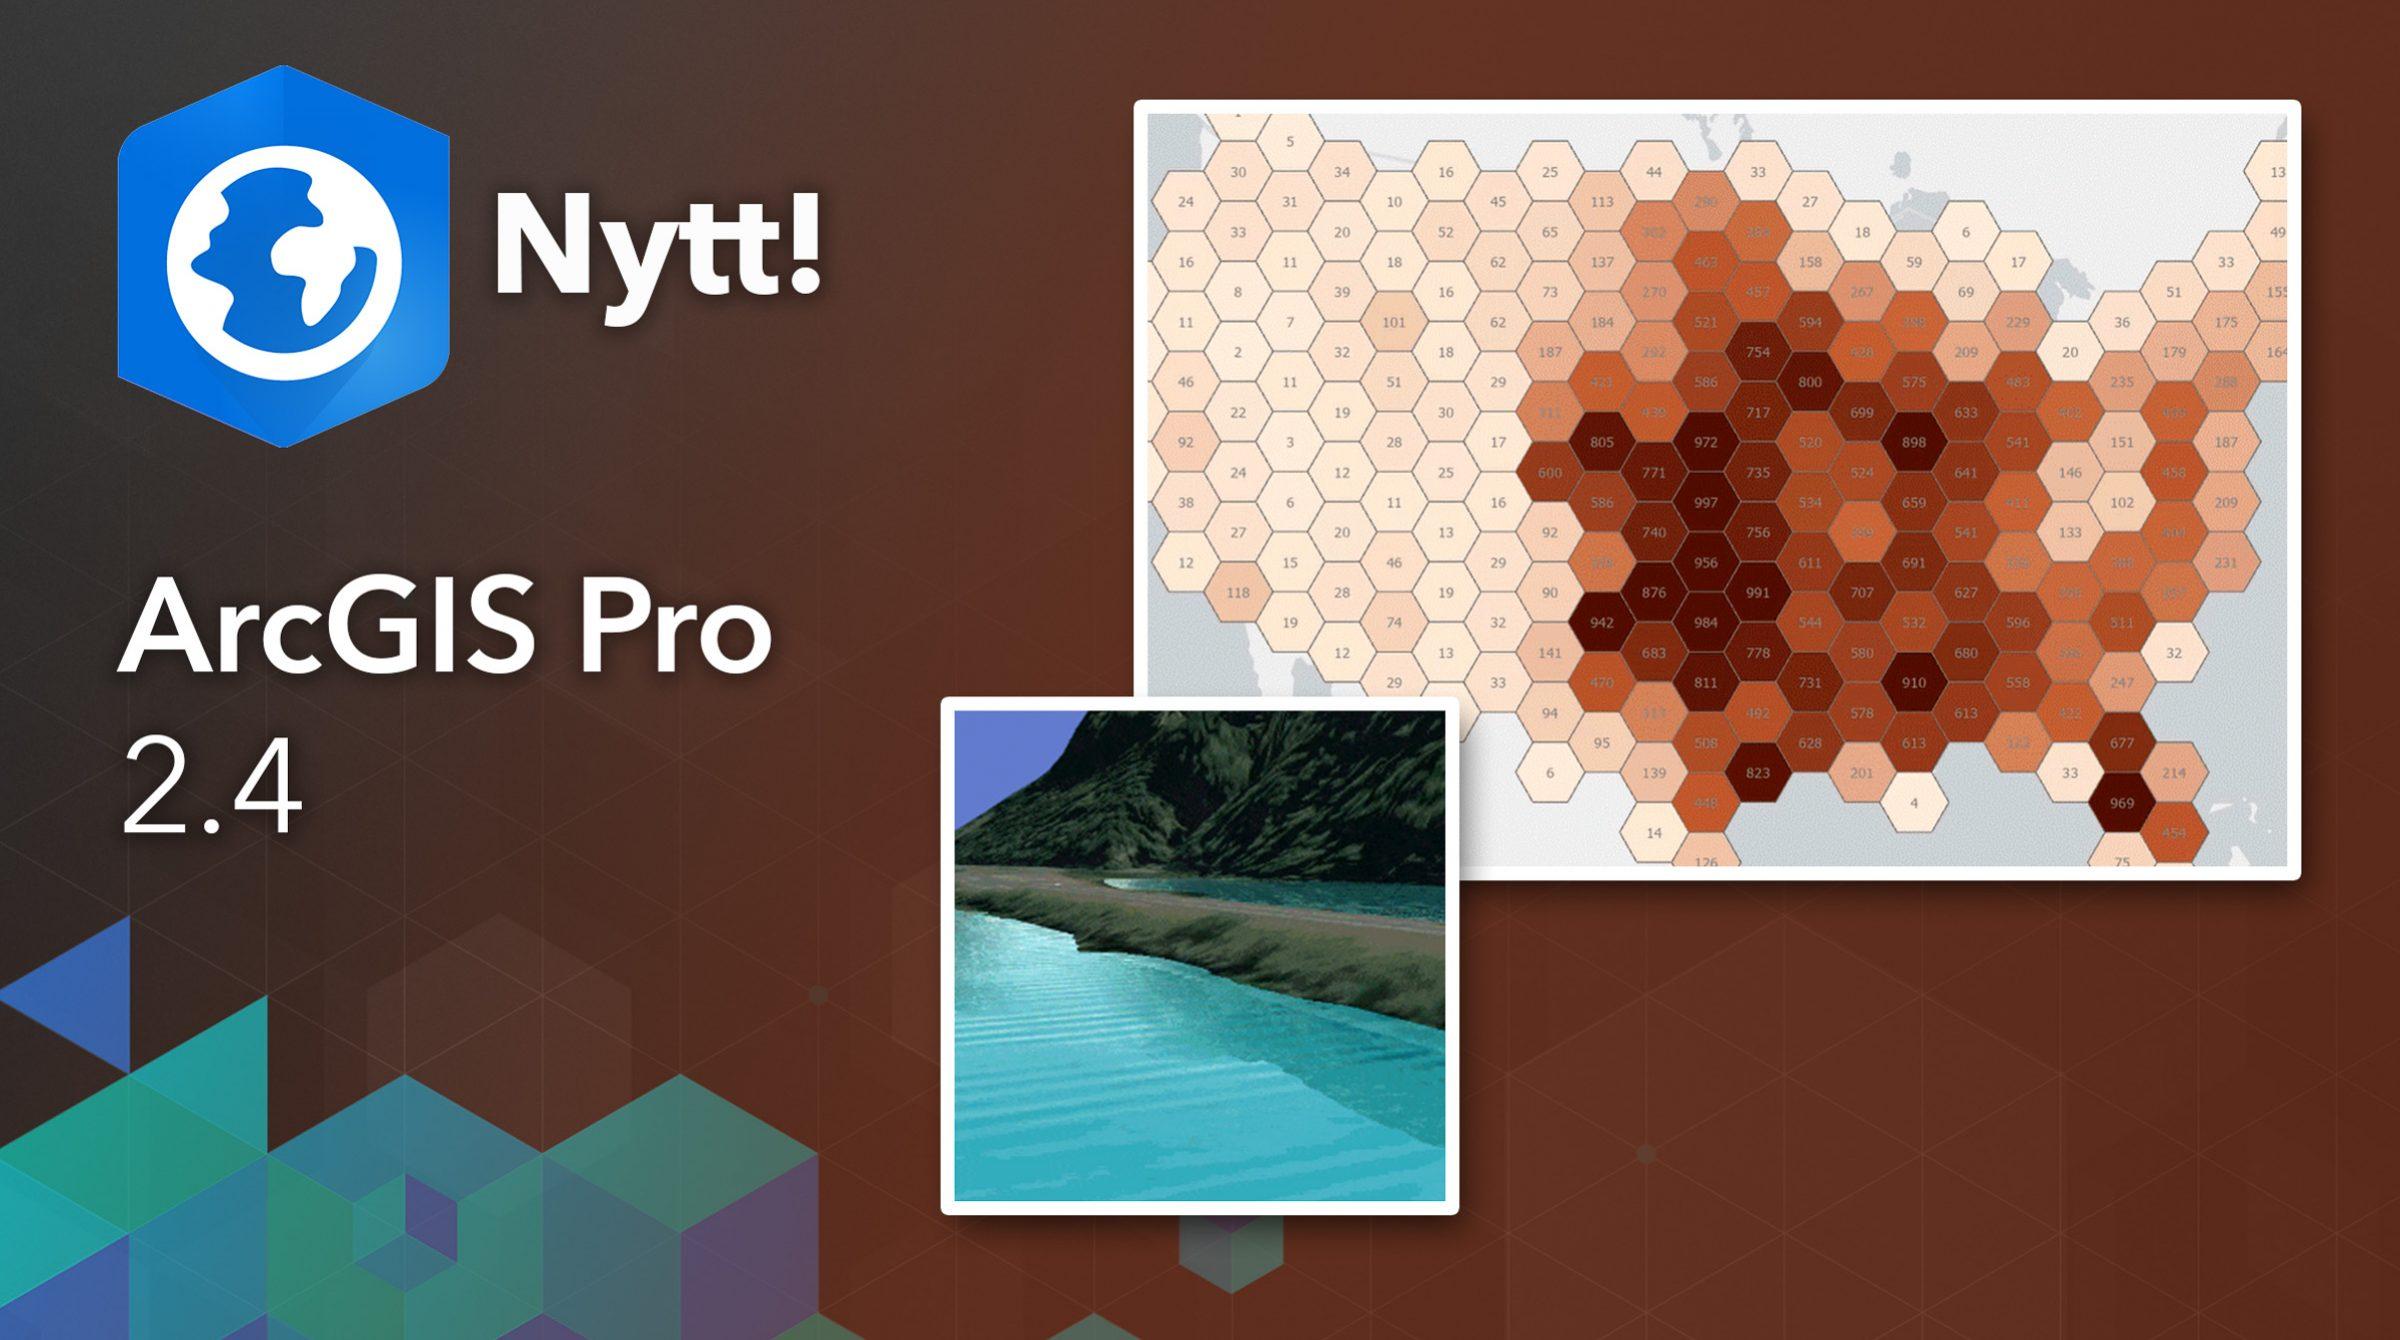 Nytt i ArcGIS Pro 2.4